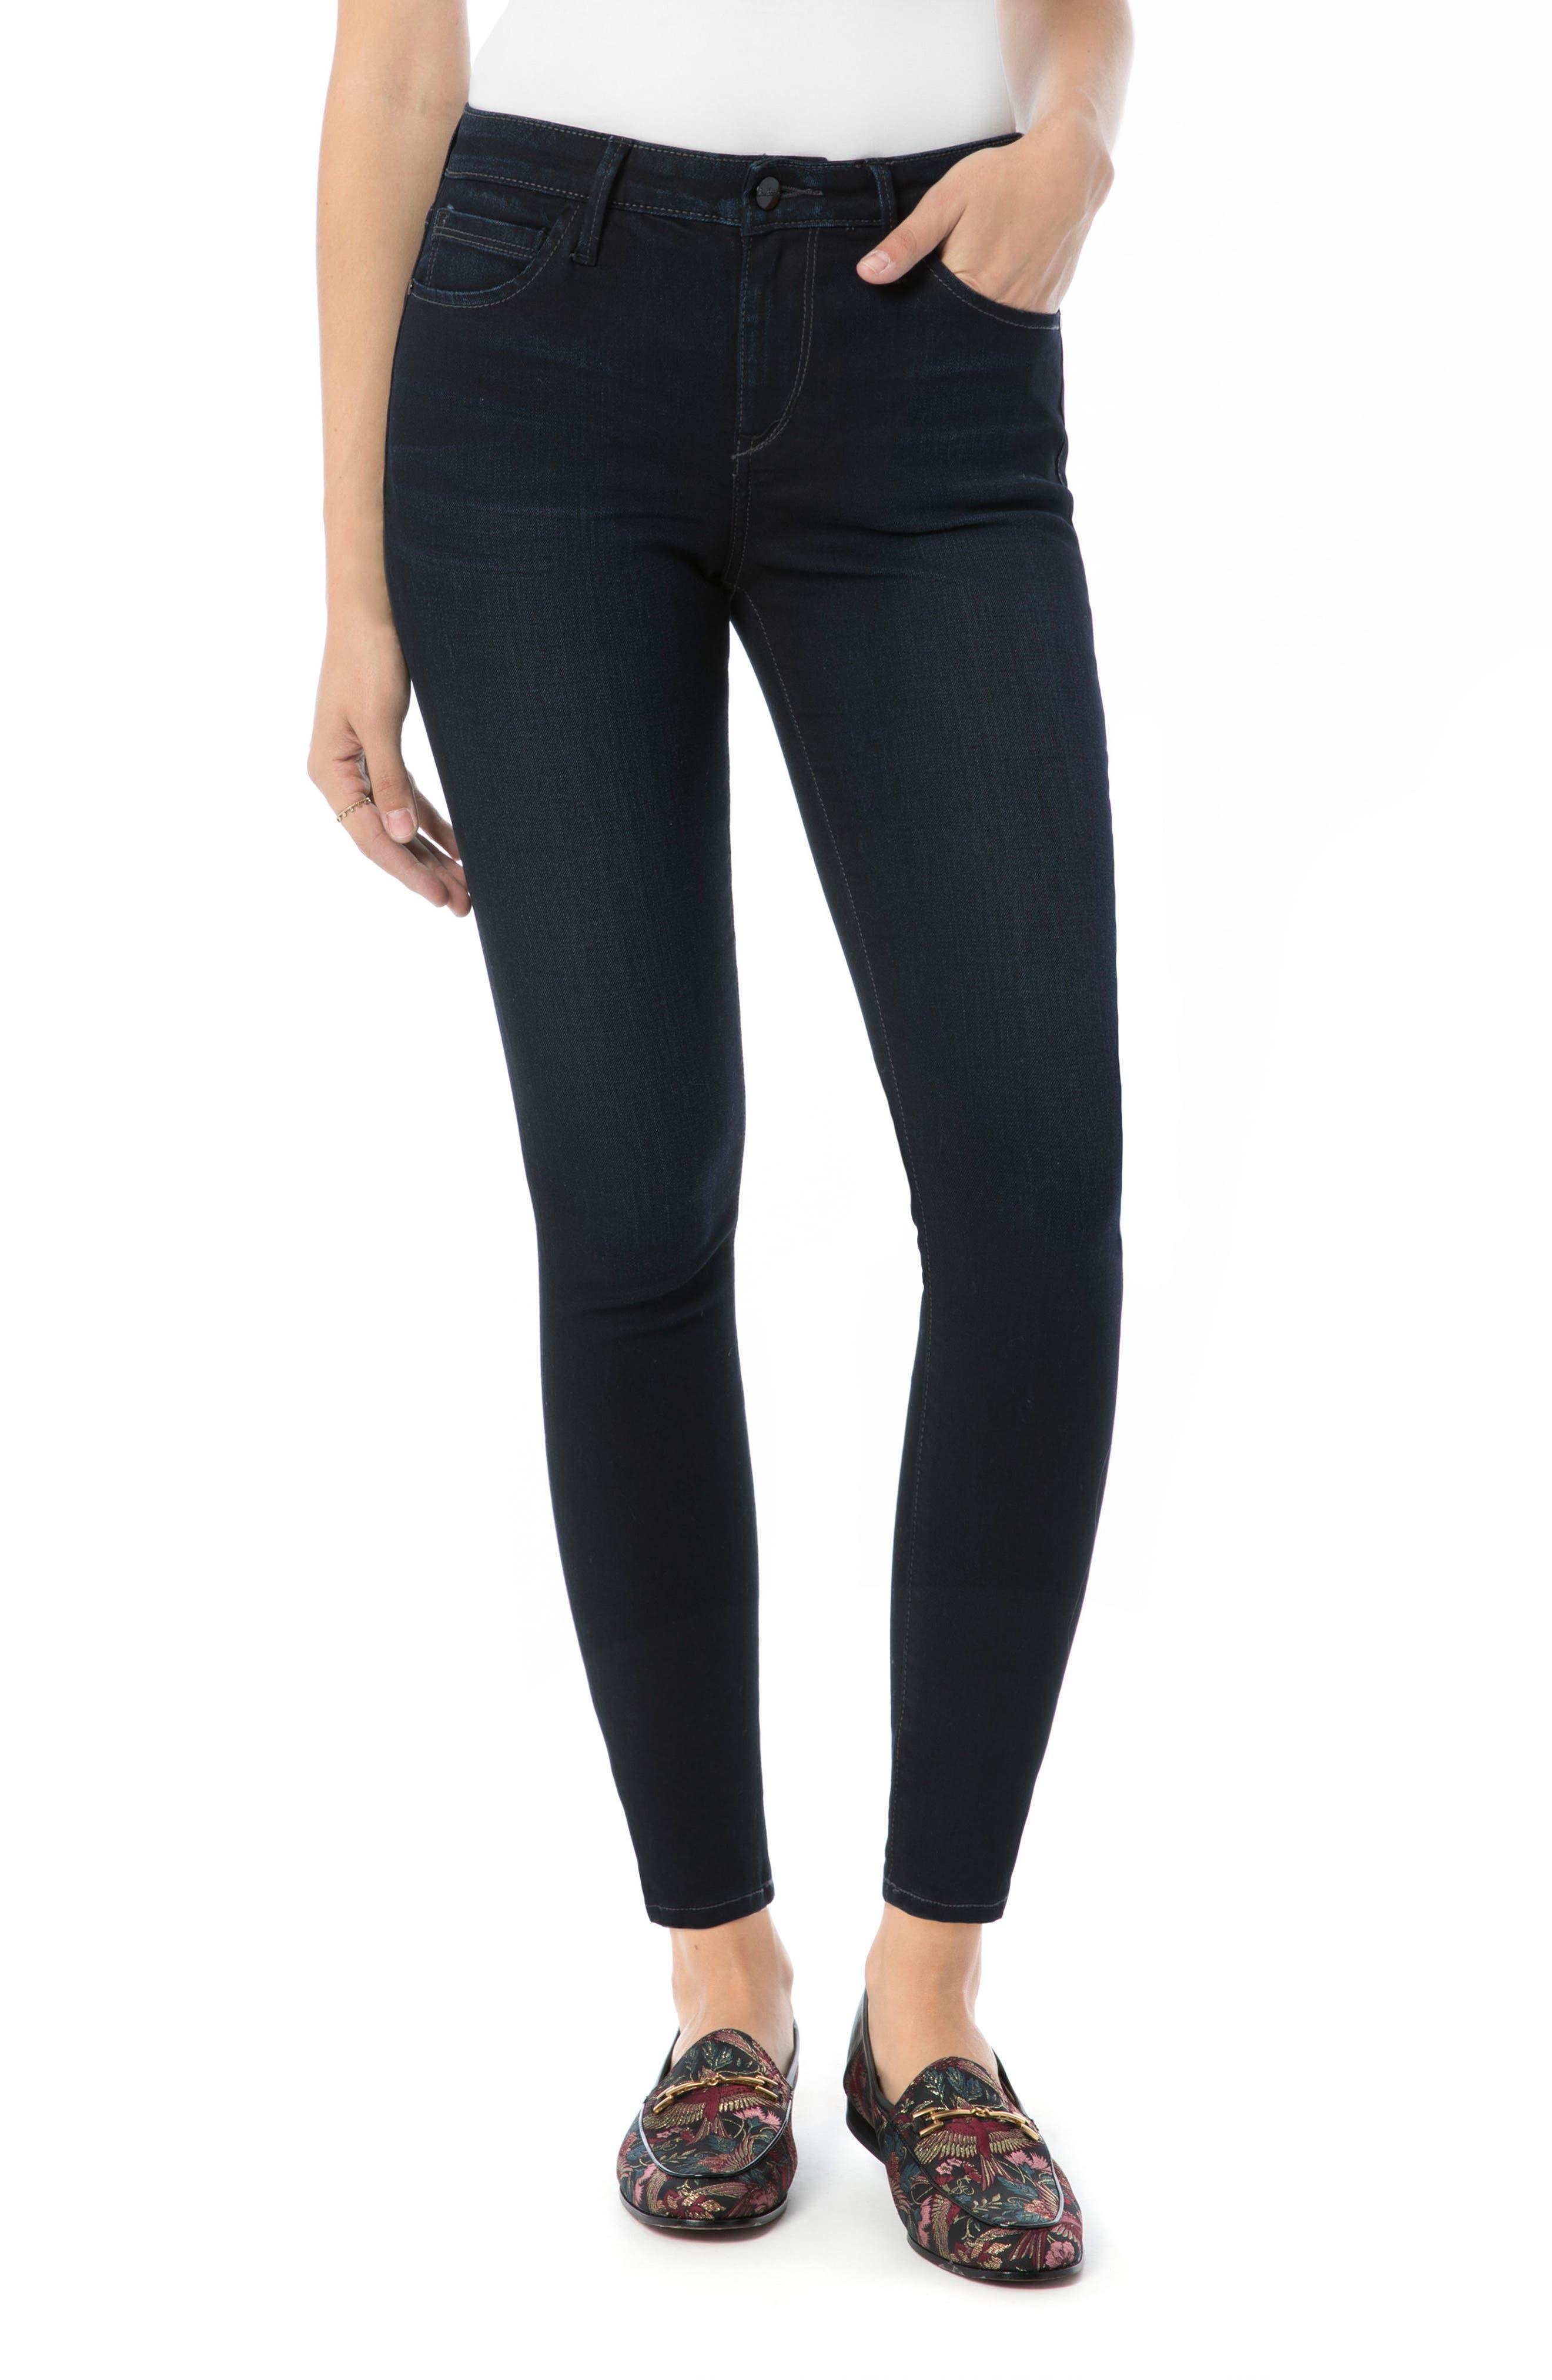 Women's Sam Edelman The Kitten Ankle Jeans